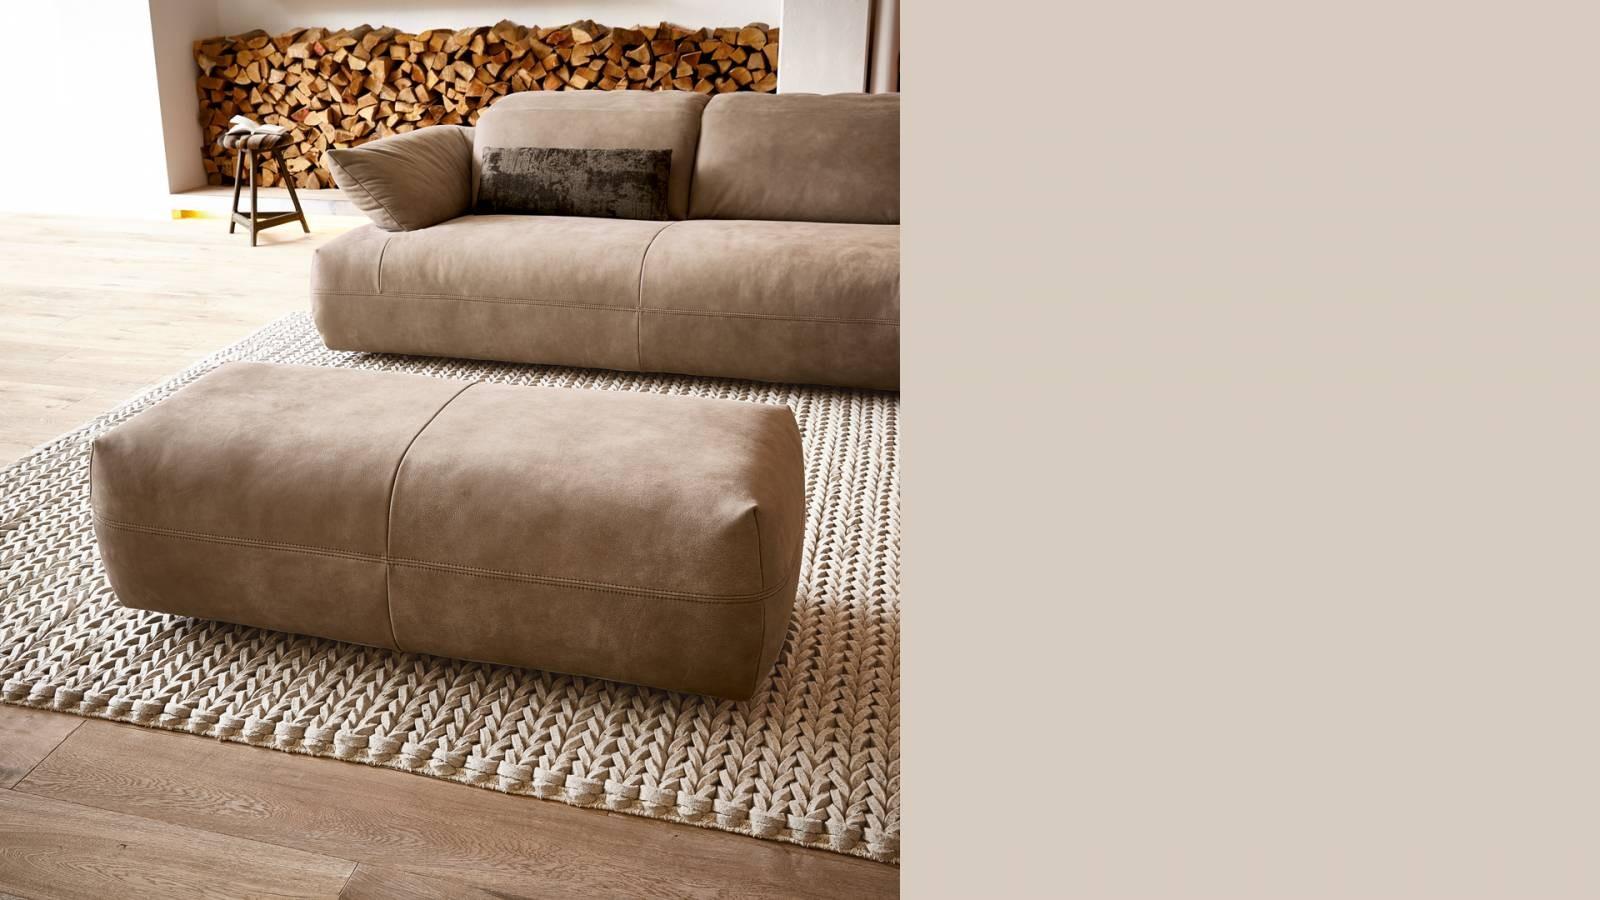 Canapea modernă Koinor Avivo